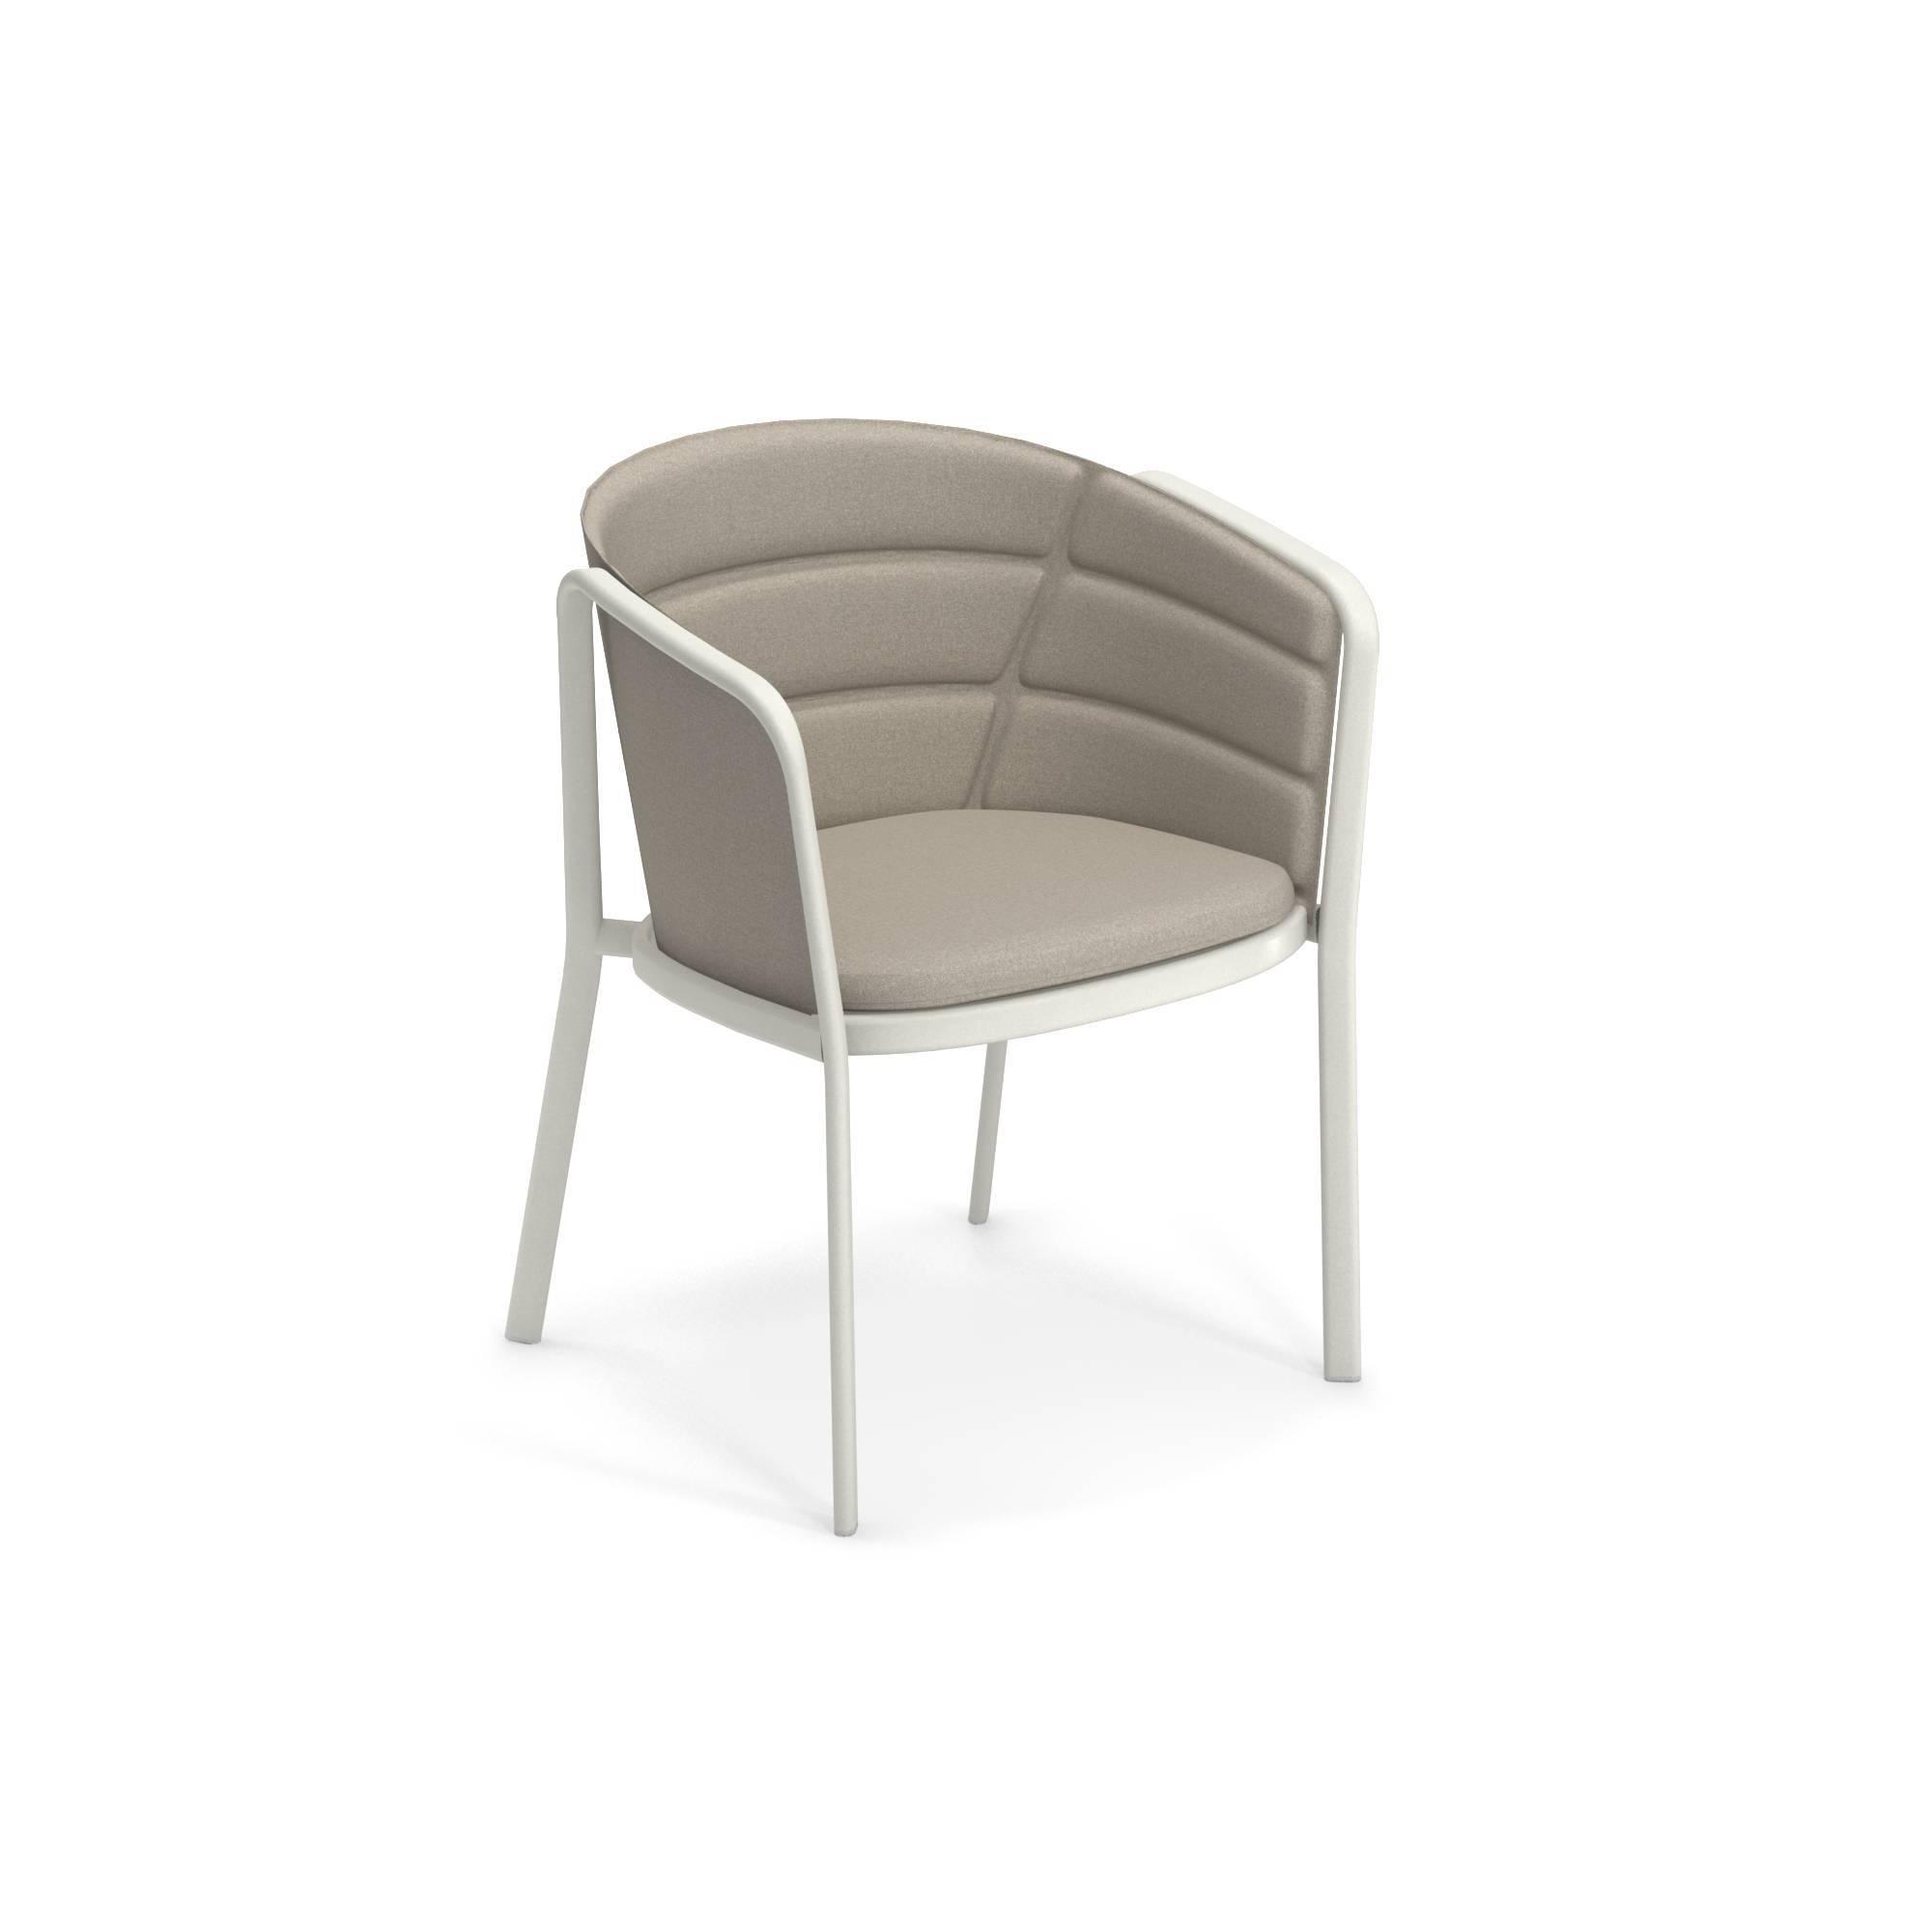 Carousel 1210 Outdoor Stuhl Emu Weiß